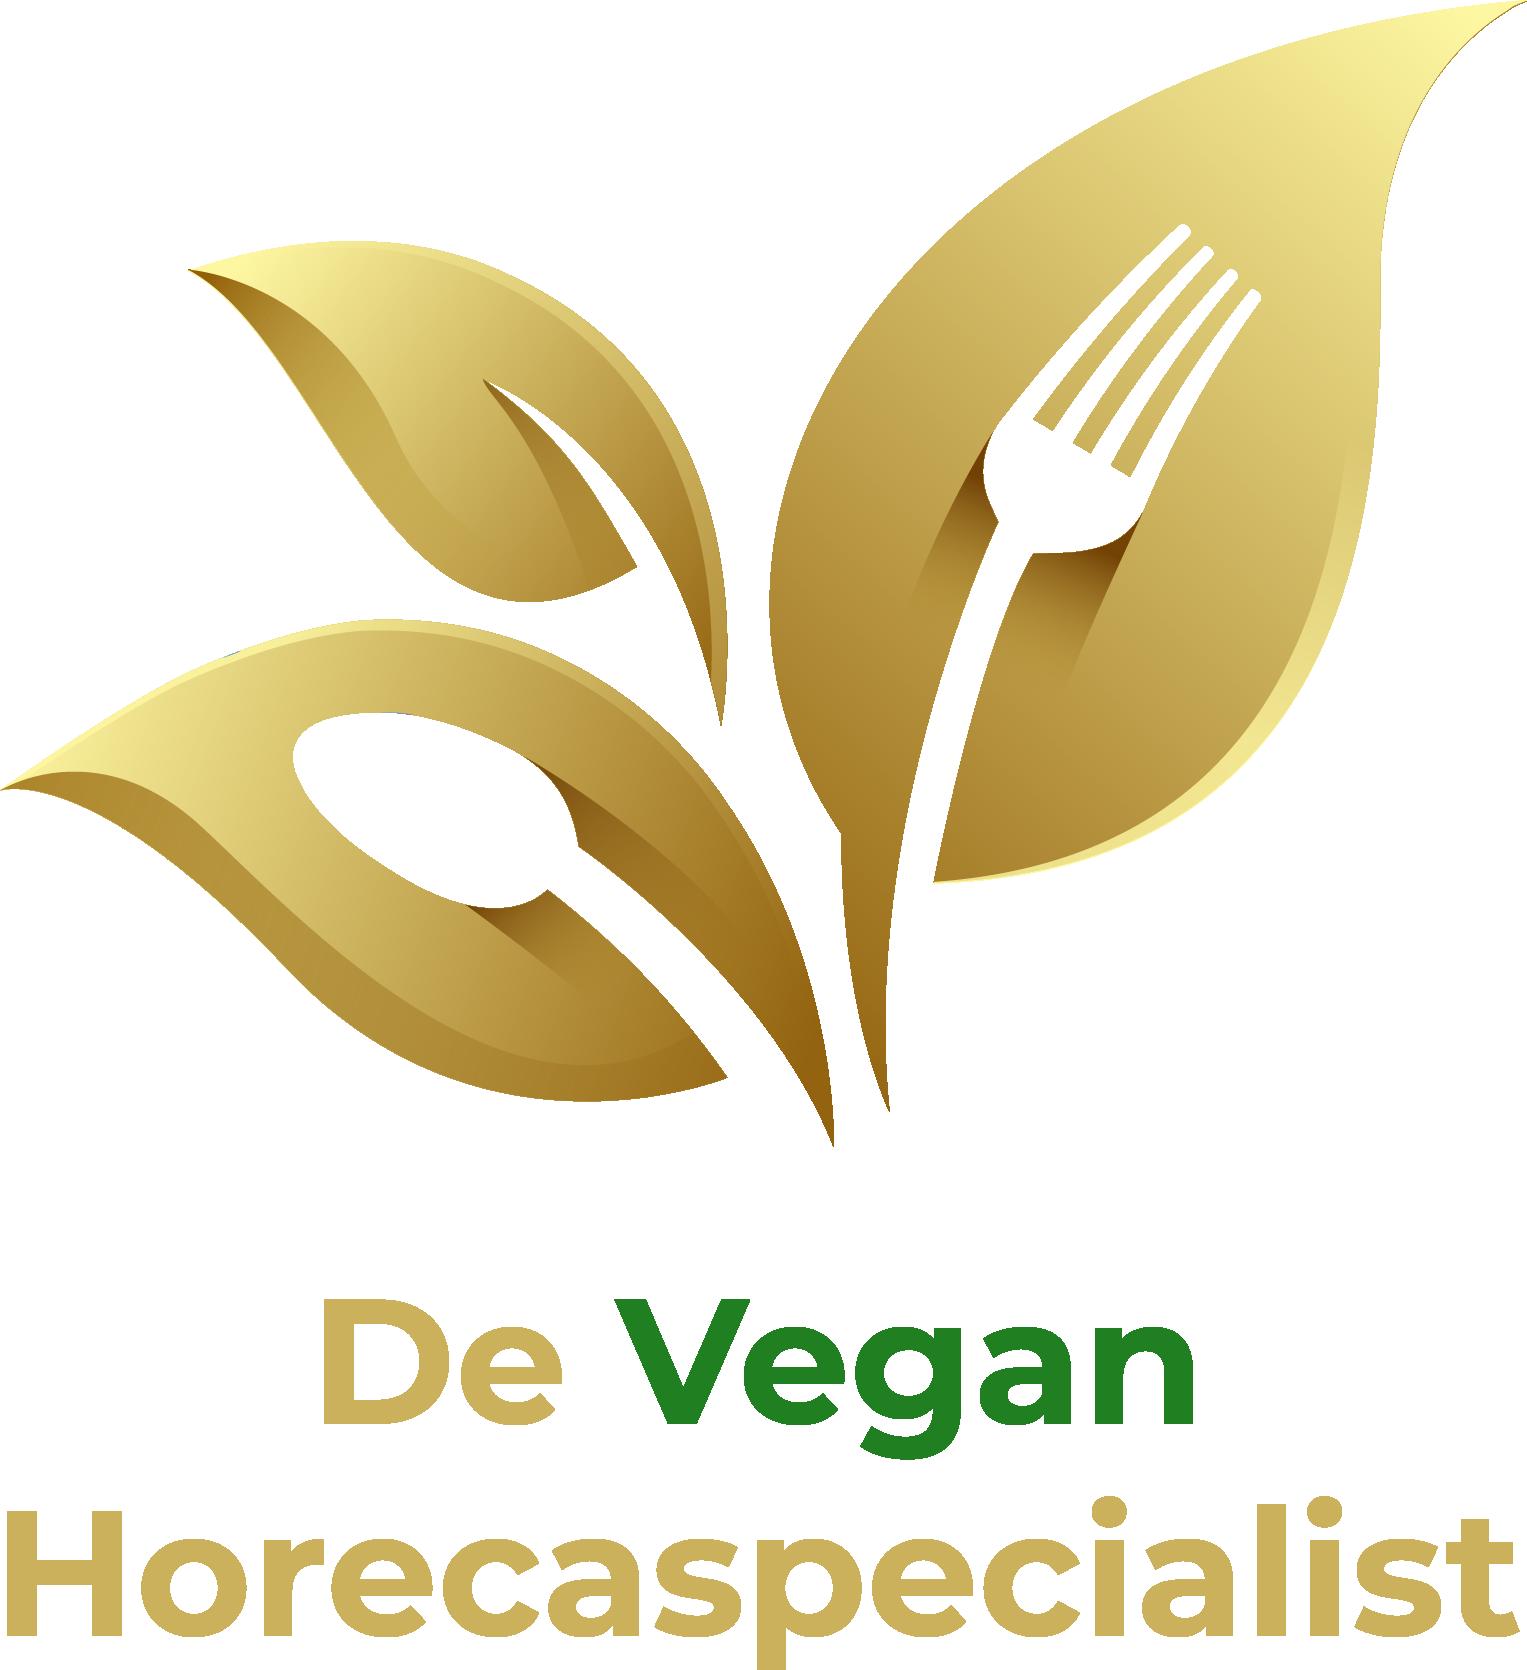 De Vegan Horecaspecialist